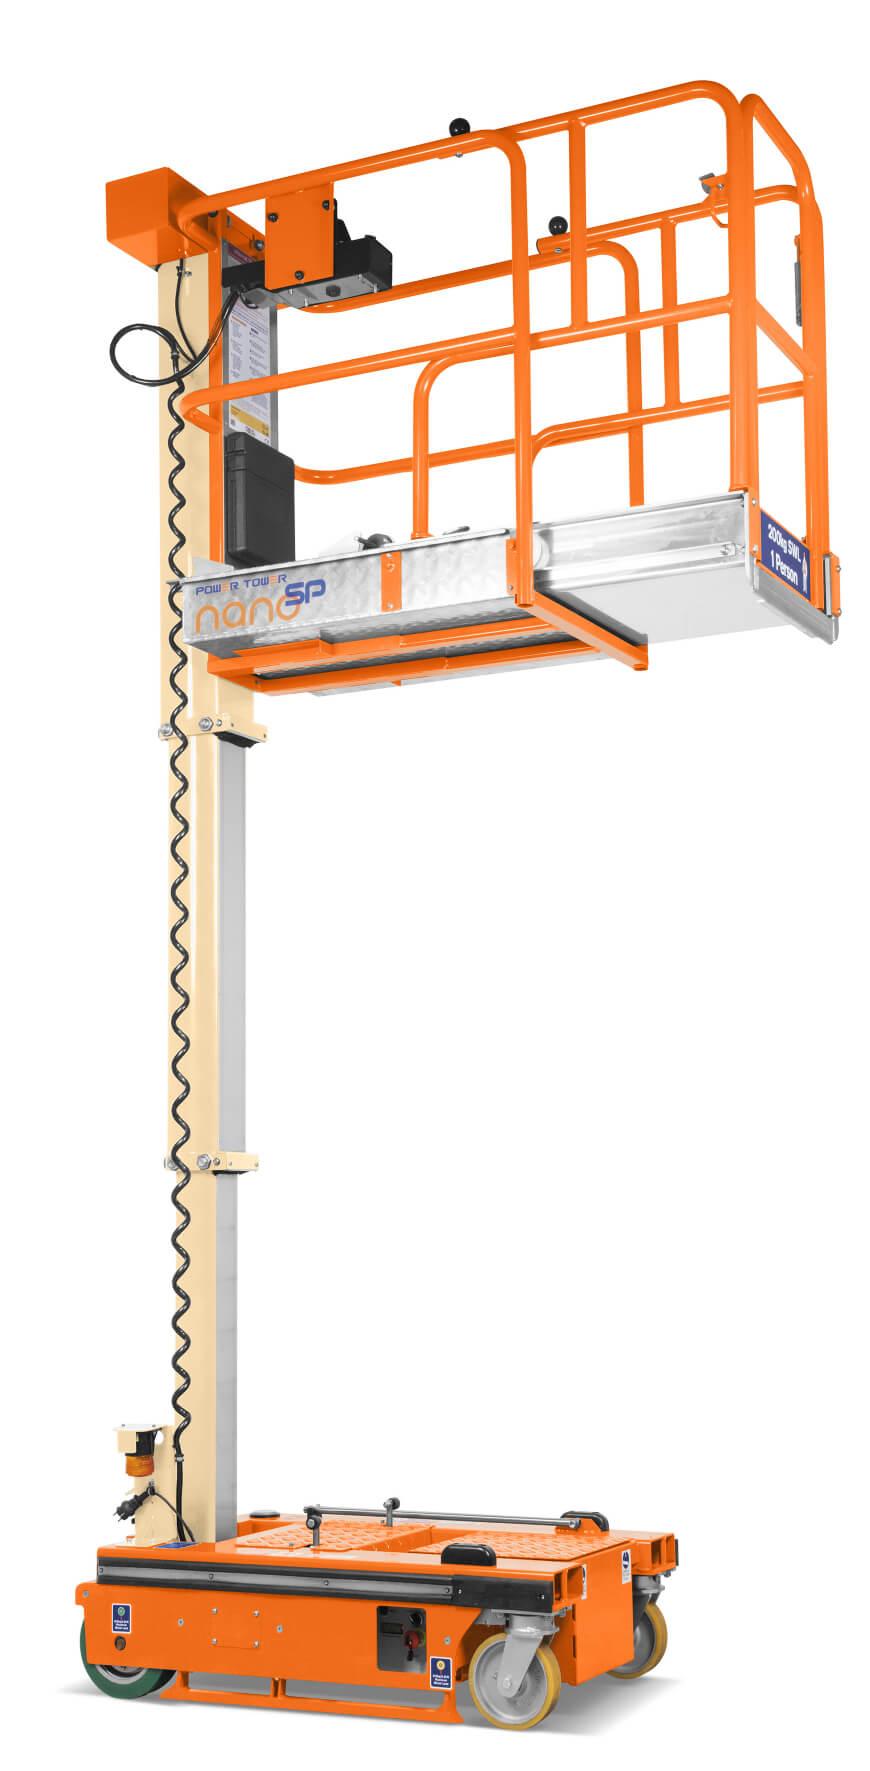 Vertical Lift Rental   Vertical Lift for Rent   Aerial Work Platform